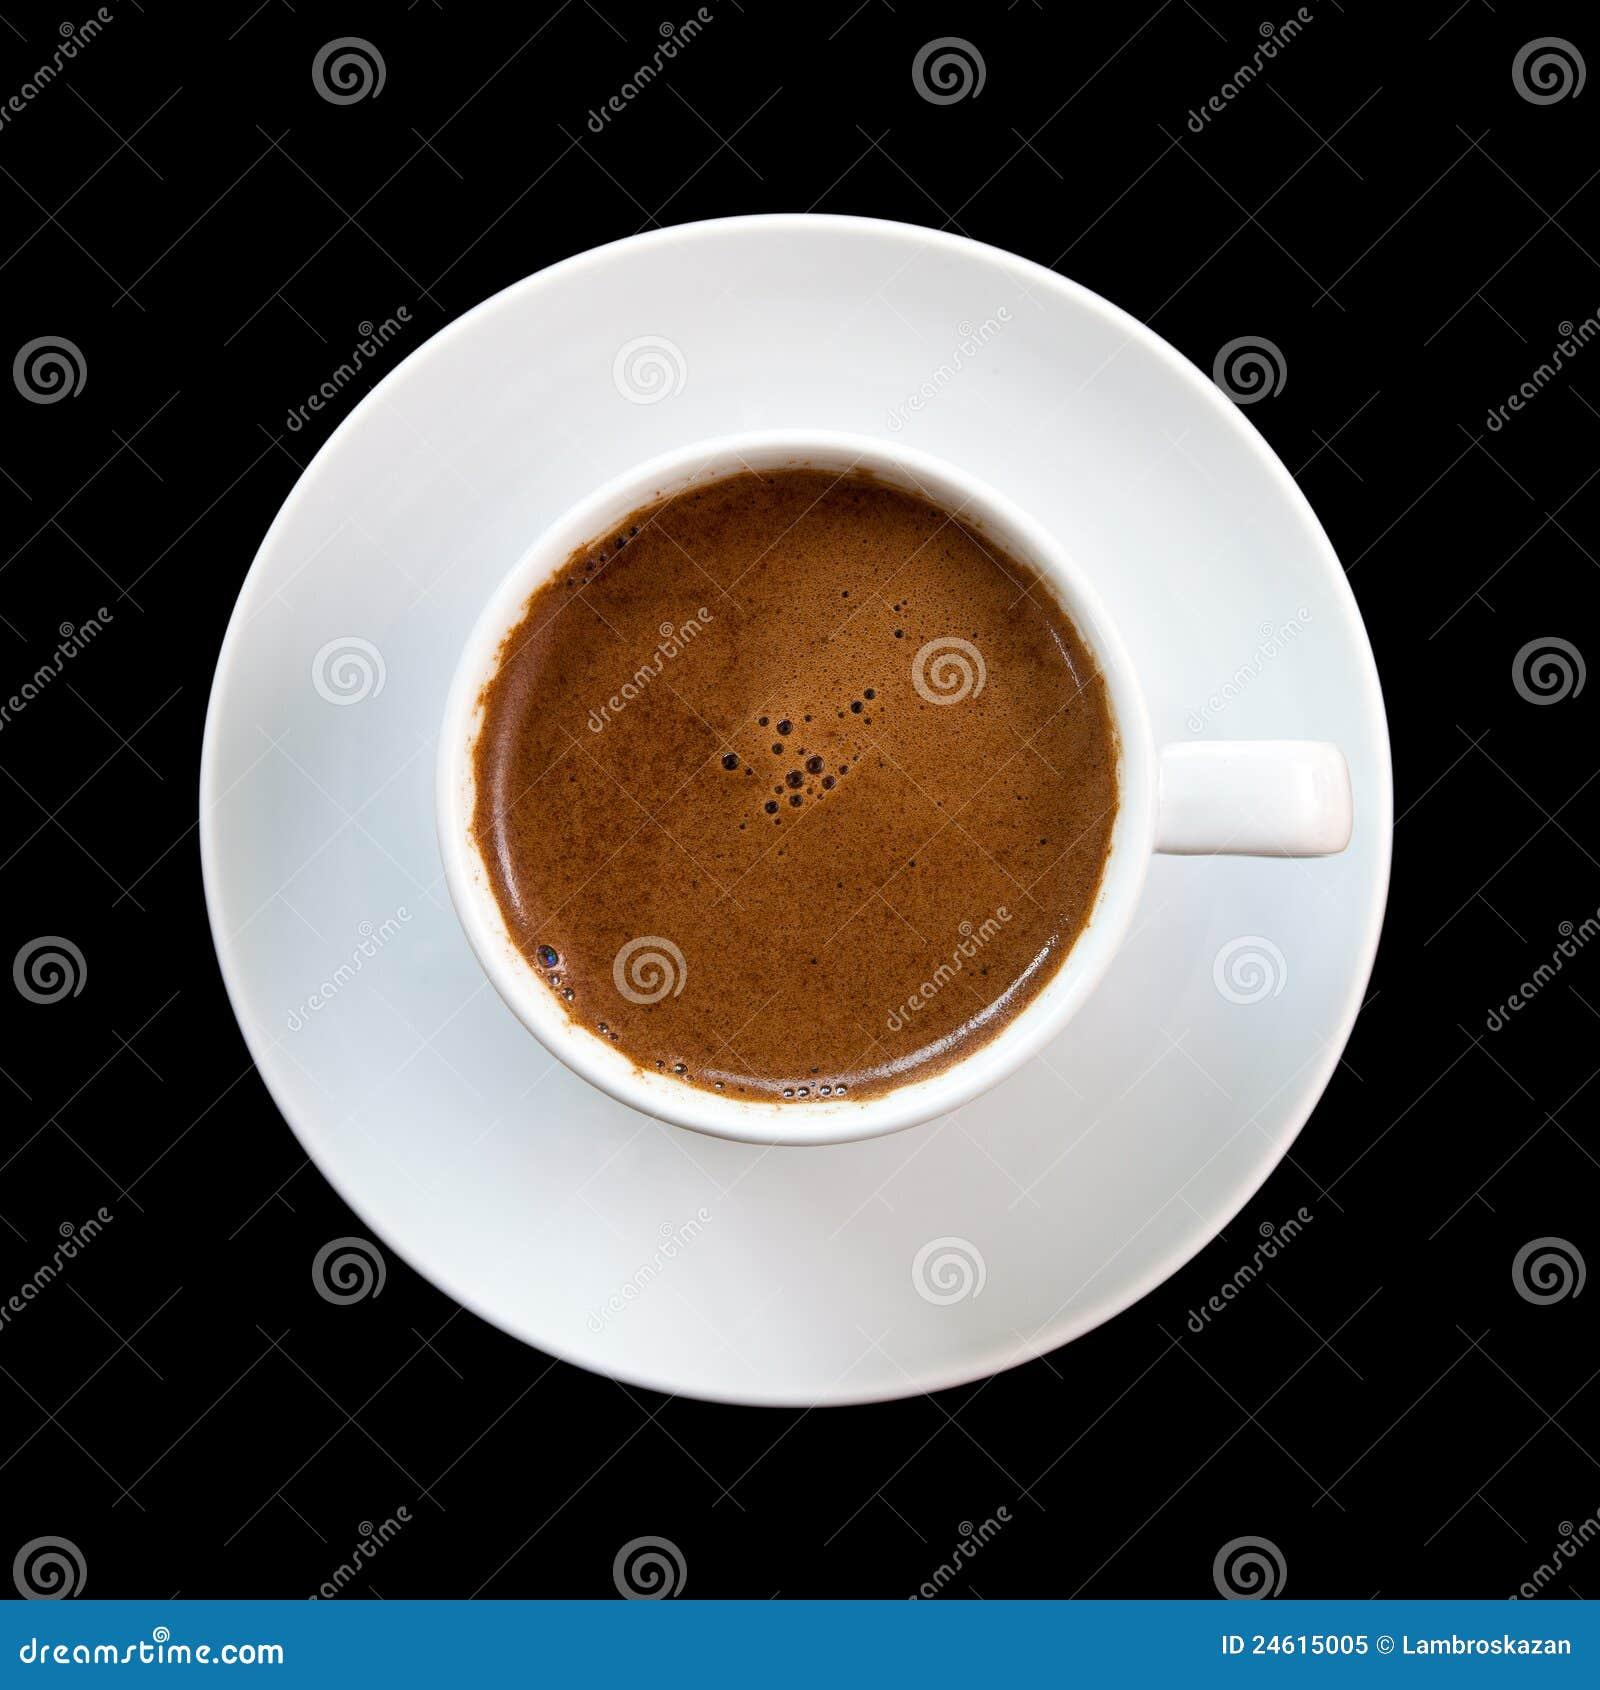 Greek Coffee Isolated On Black Background Stock Image